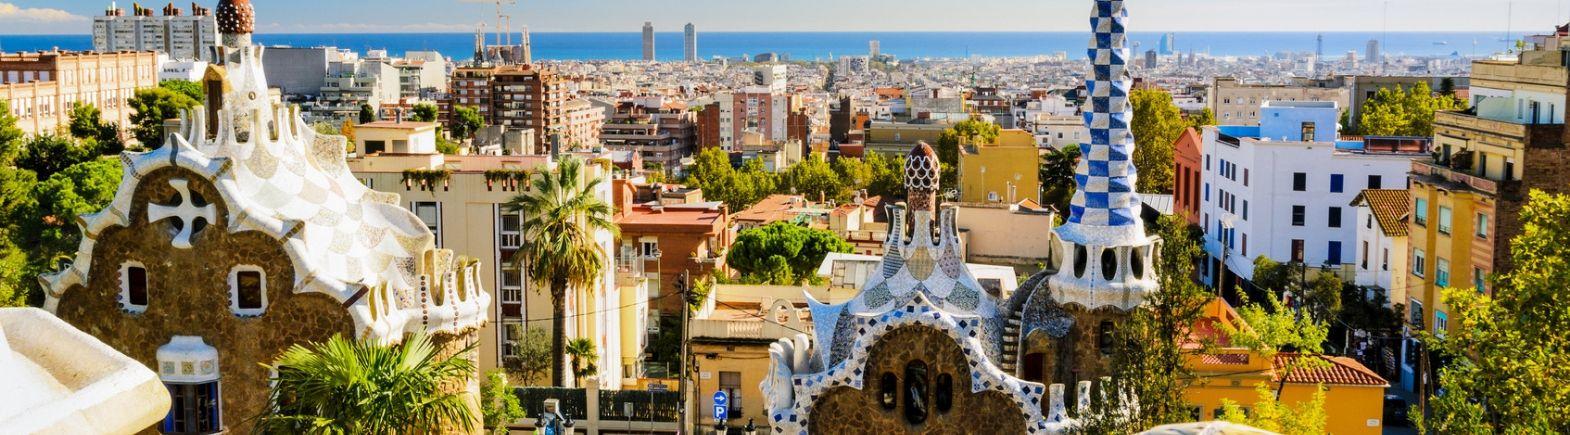 Tour of Barcelona